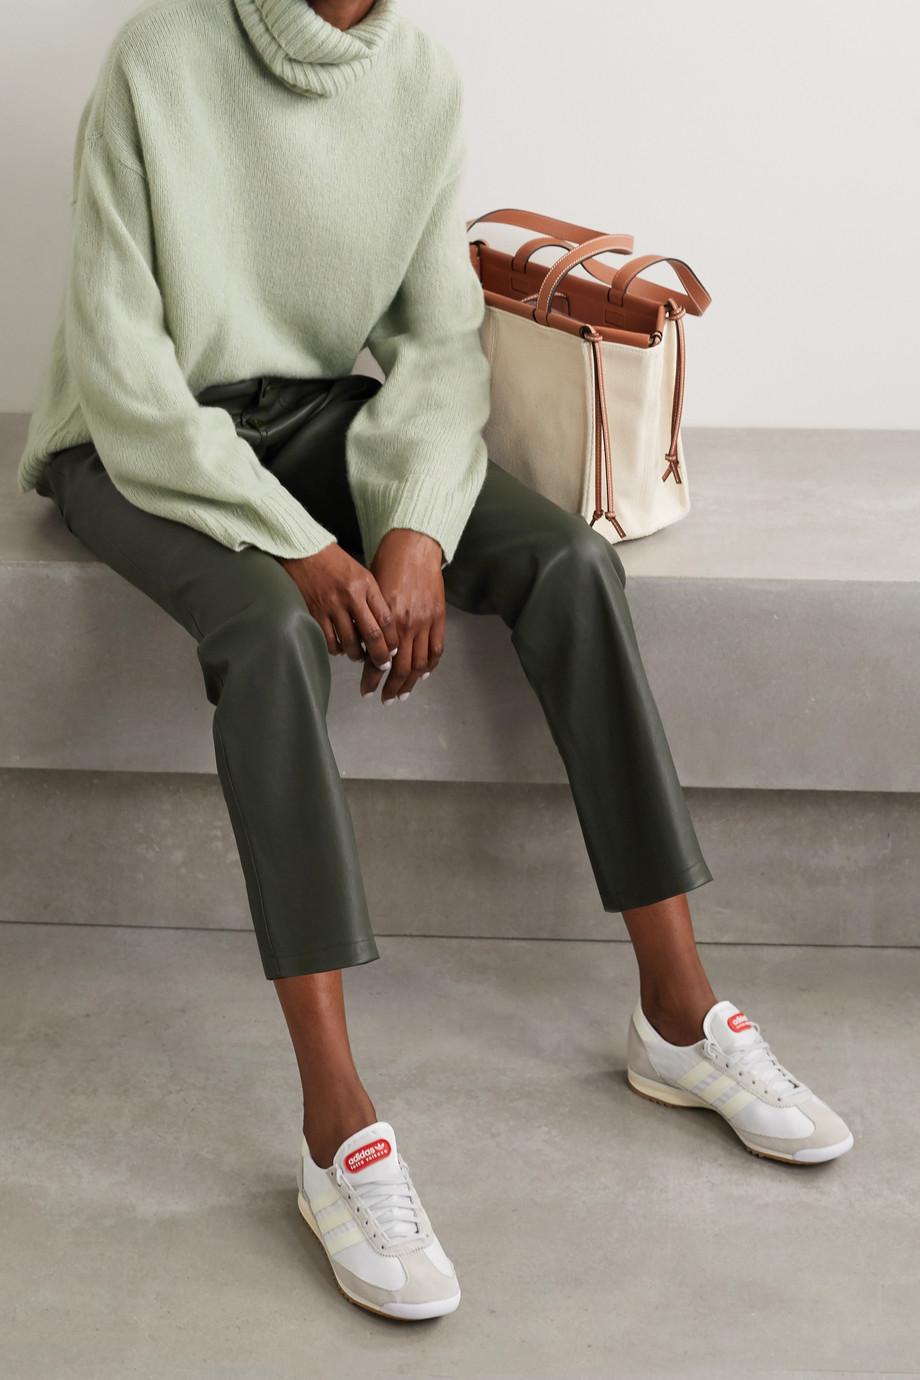 APIECE APART Vester oversized convertible cashmere and silk-blend turtleneck sweater